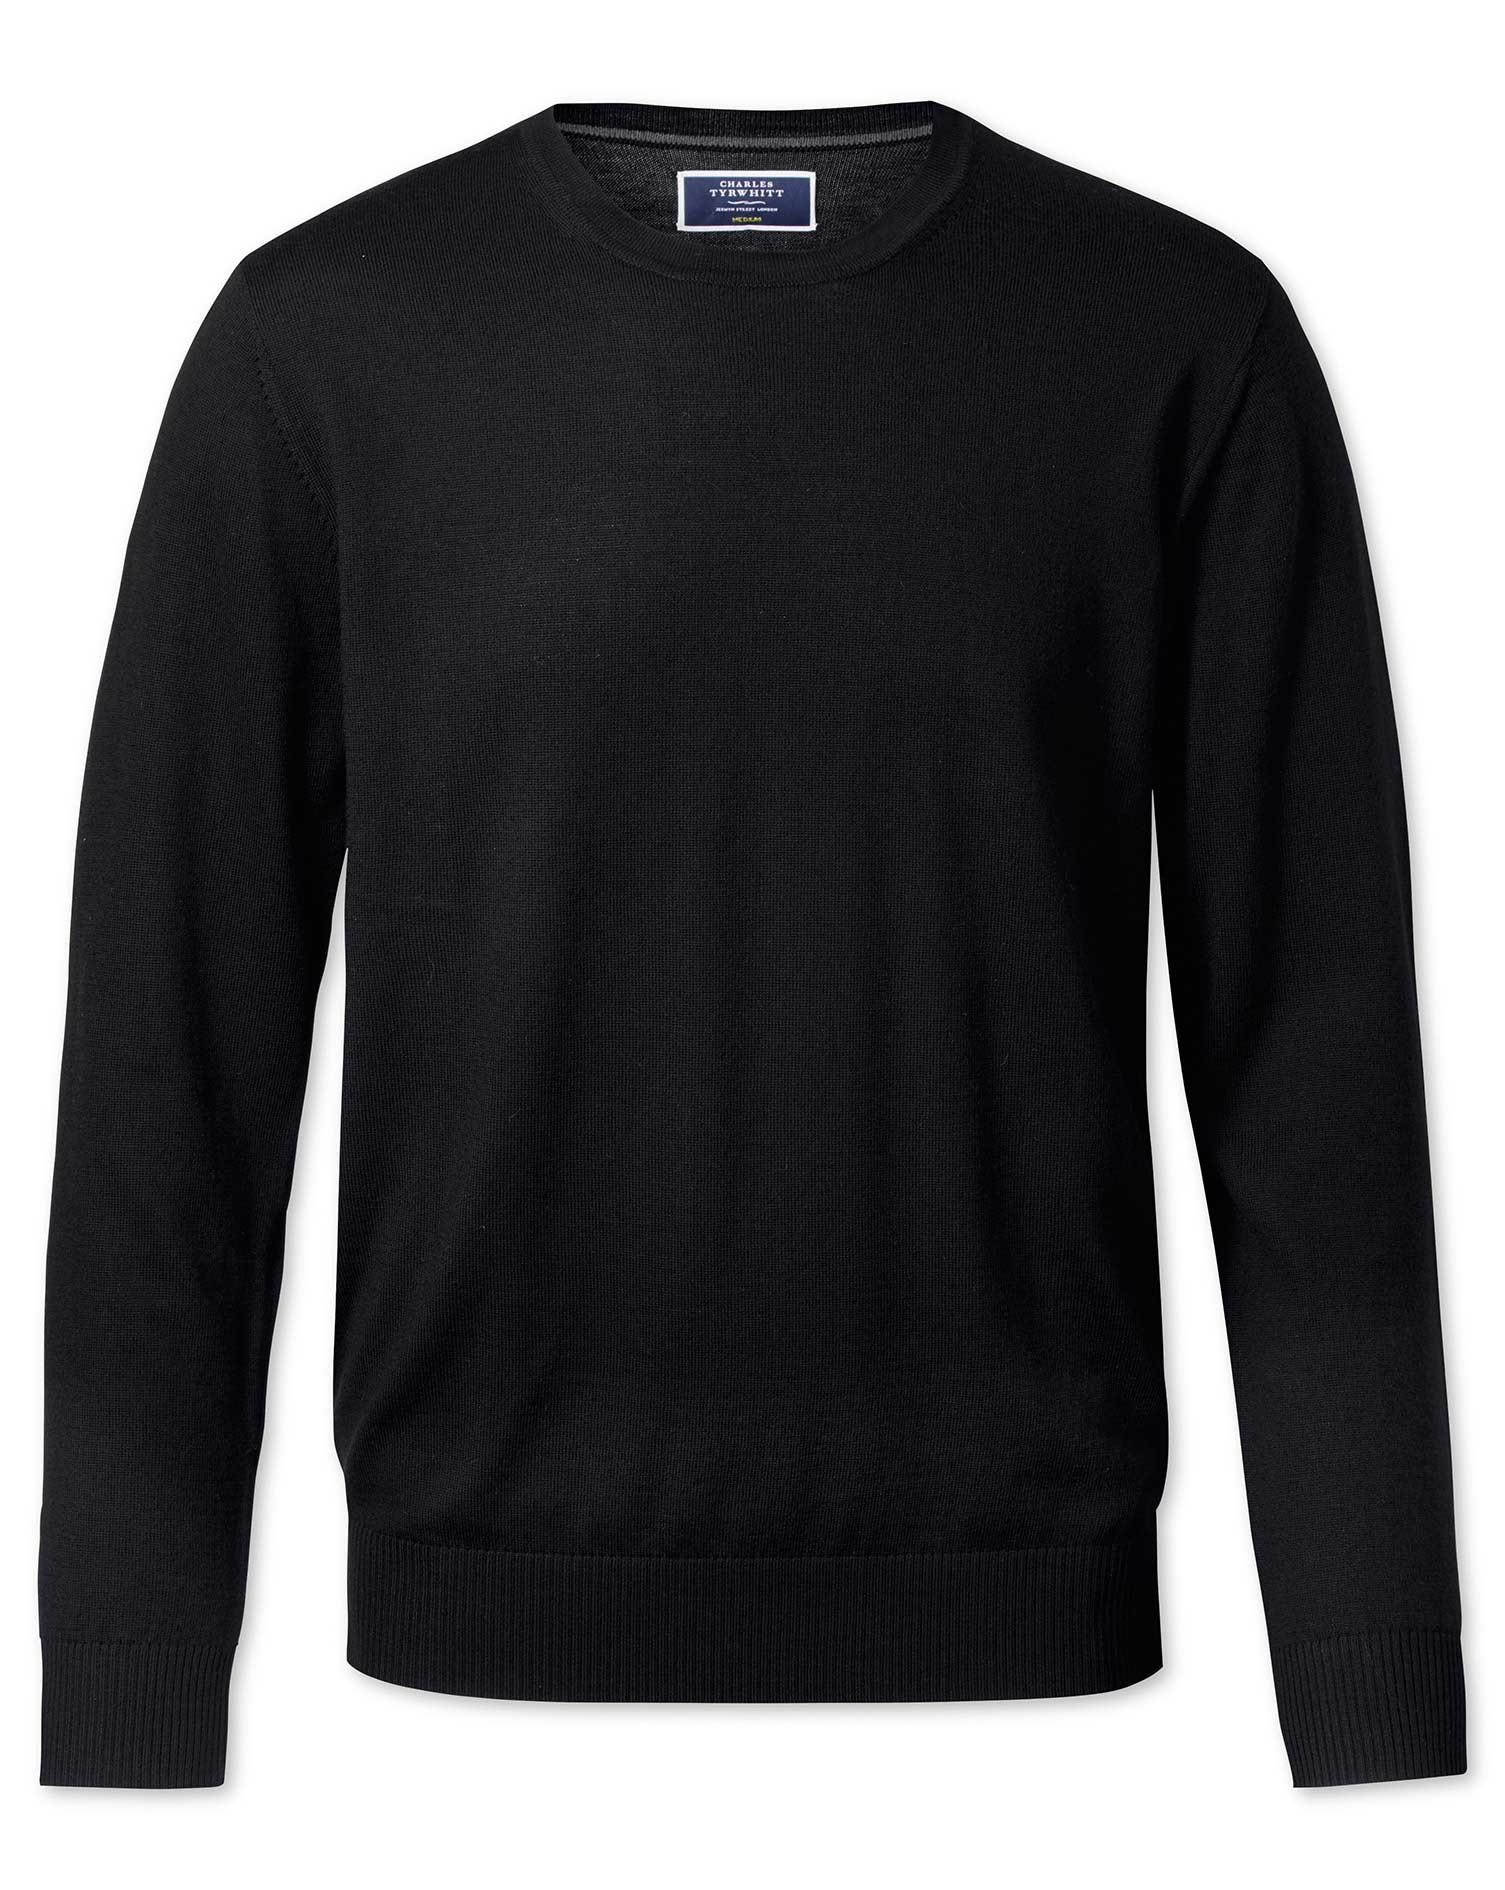 Black Merino Wool Crew Neck Jumper Size XL by Charles Tyrwhitt